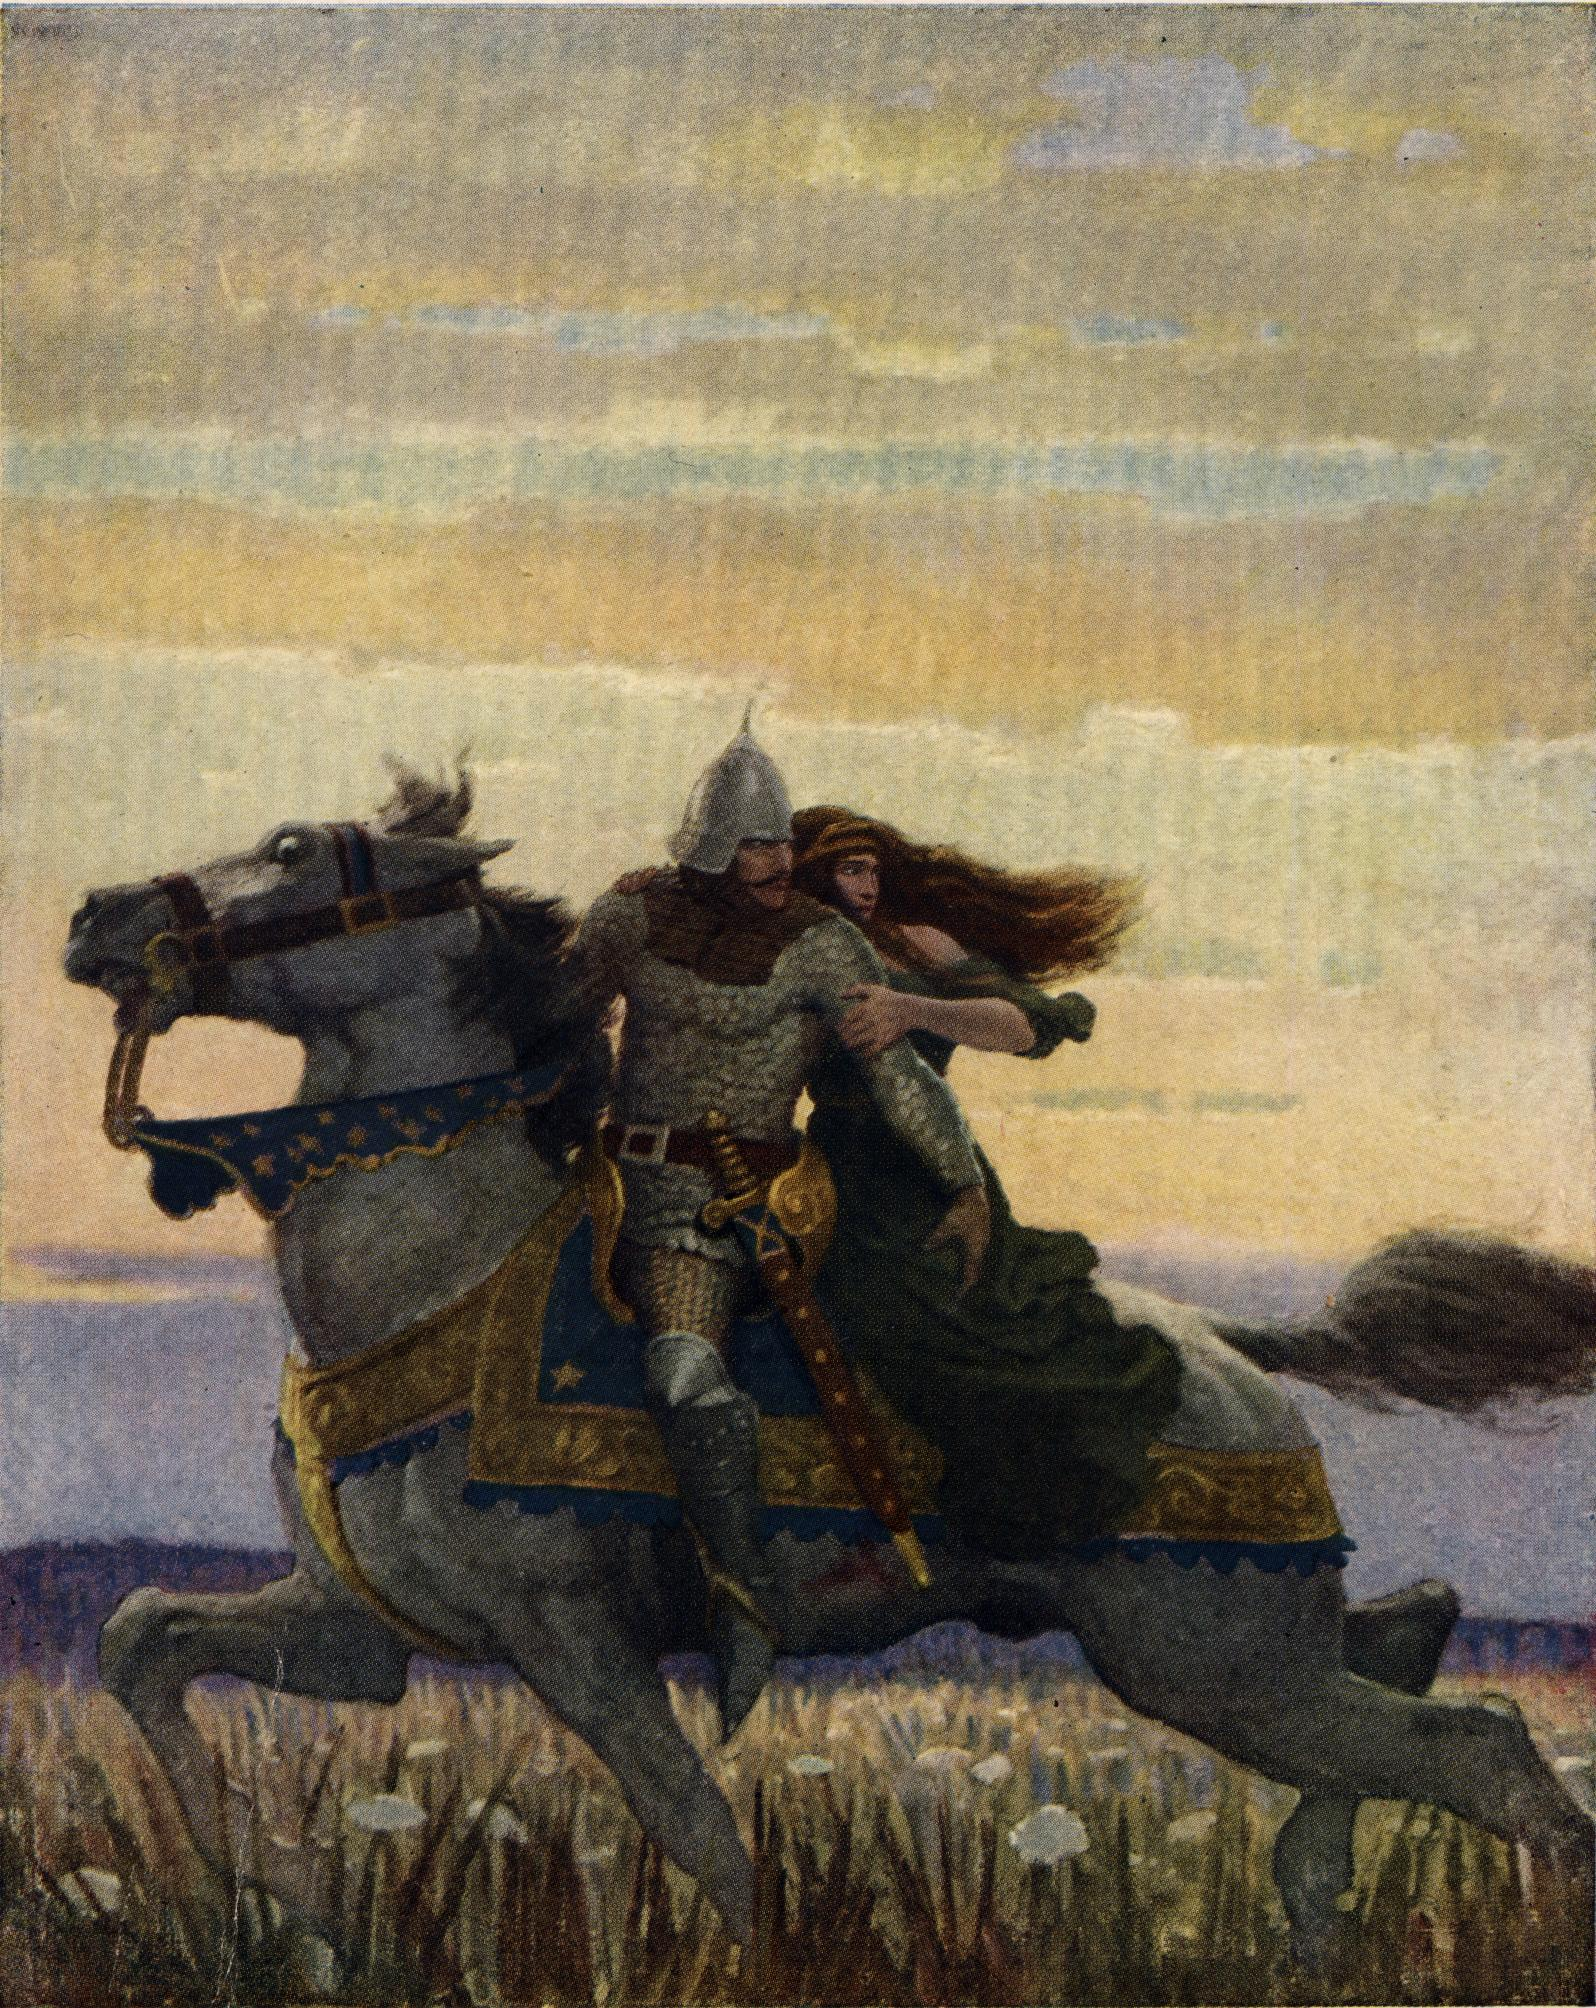 http://upload.wikimedia.org/wikipedia/commons/3/38/Boys_King_Arthur_-_N._C._Wyeth_-_p278.jpg